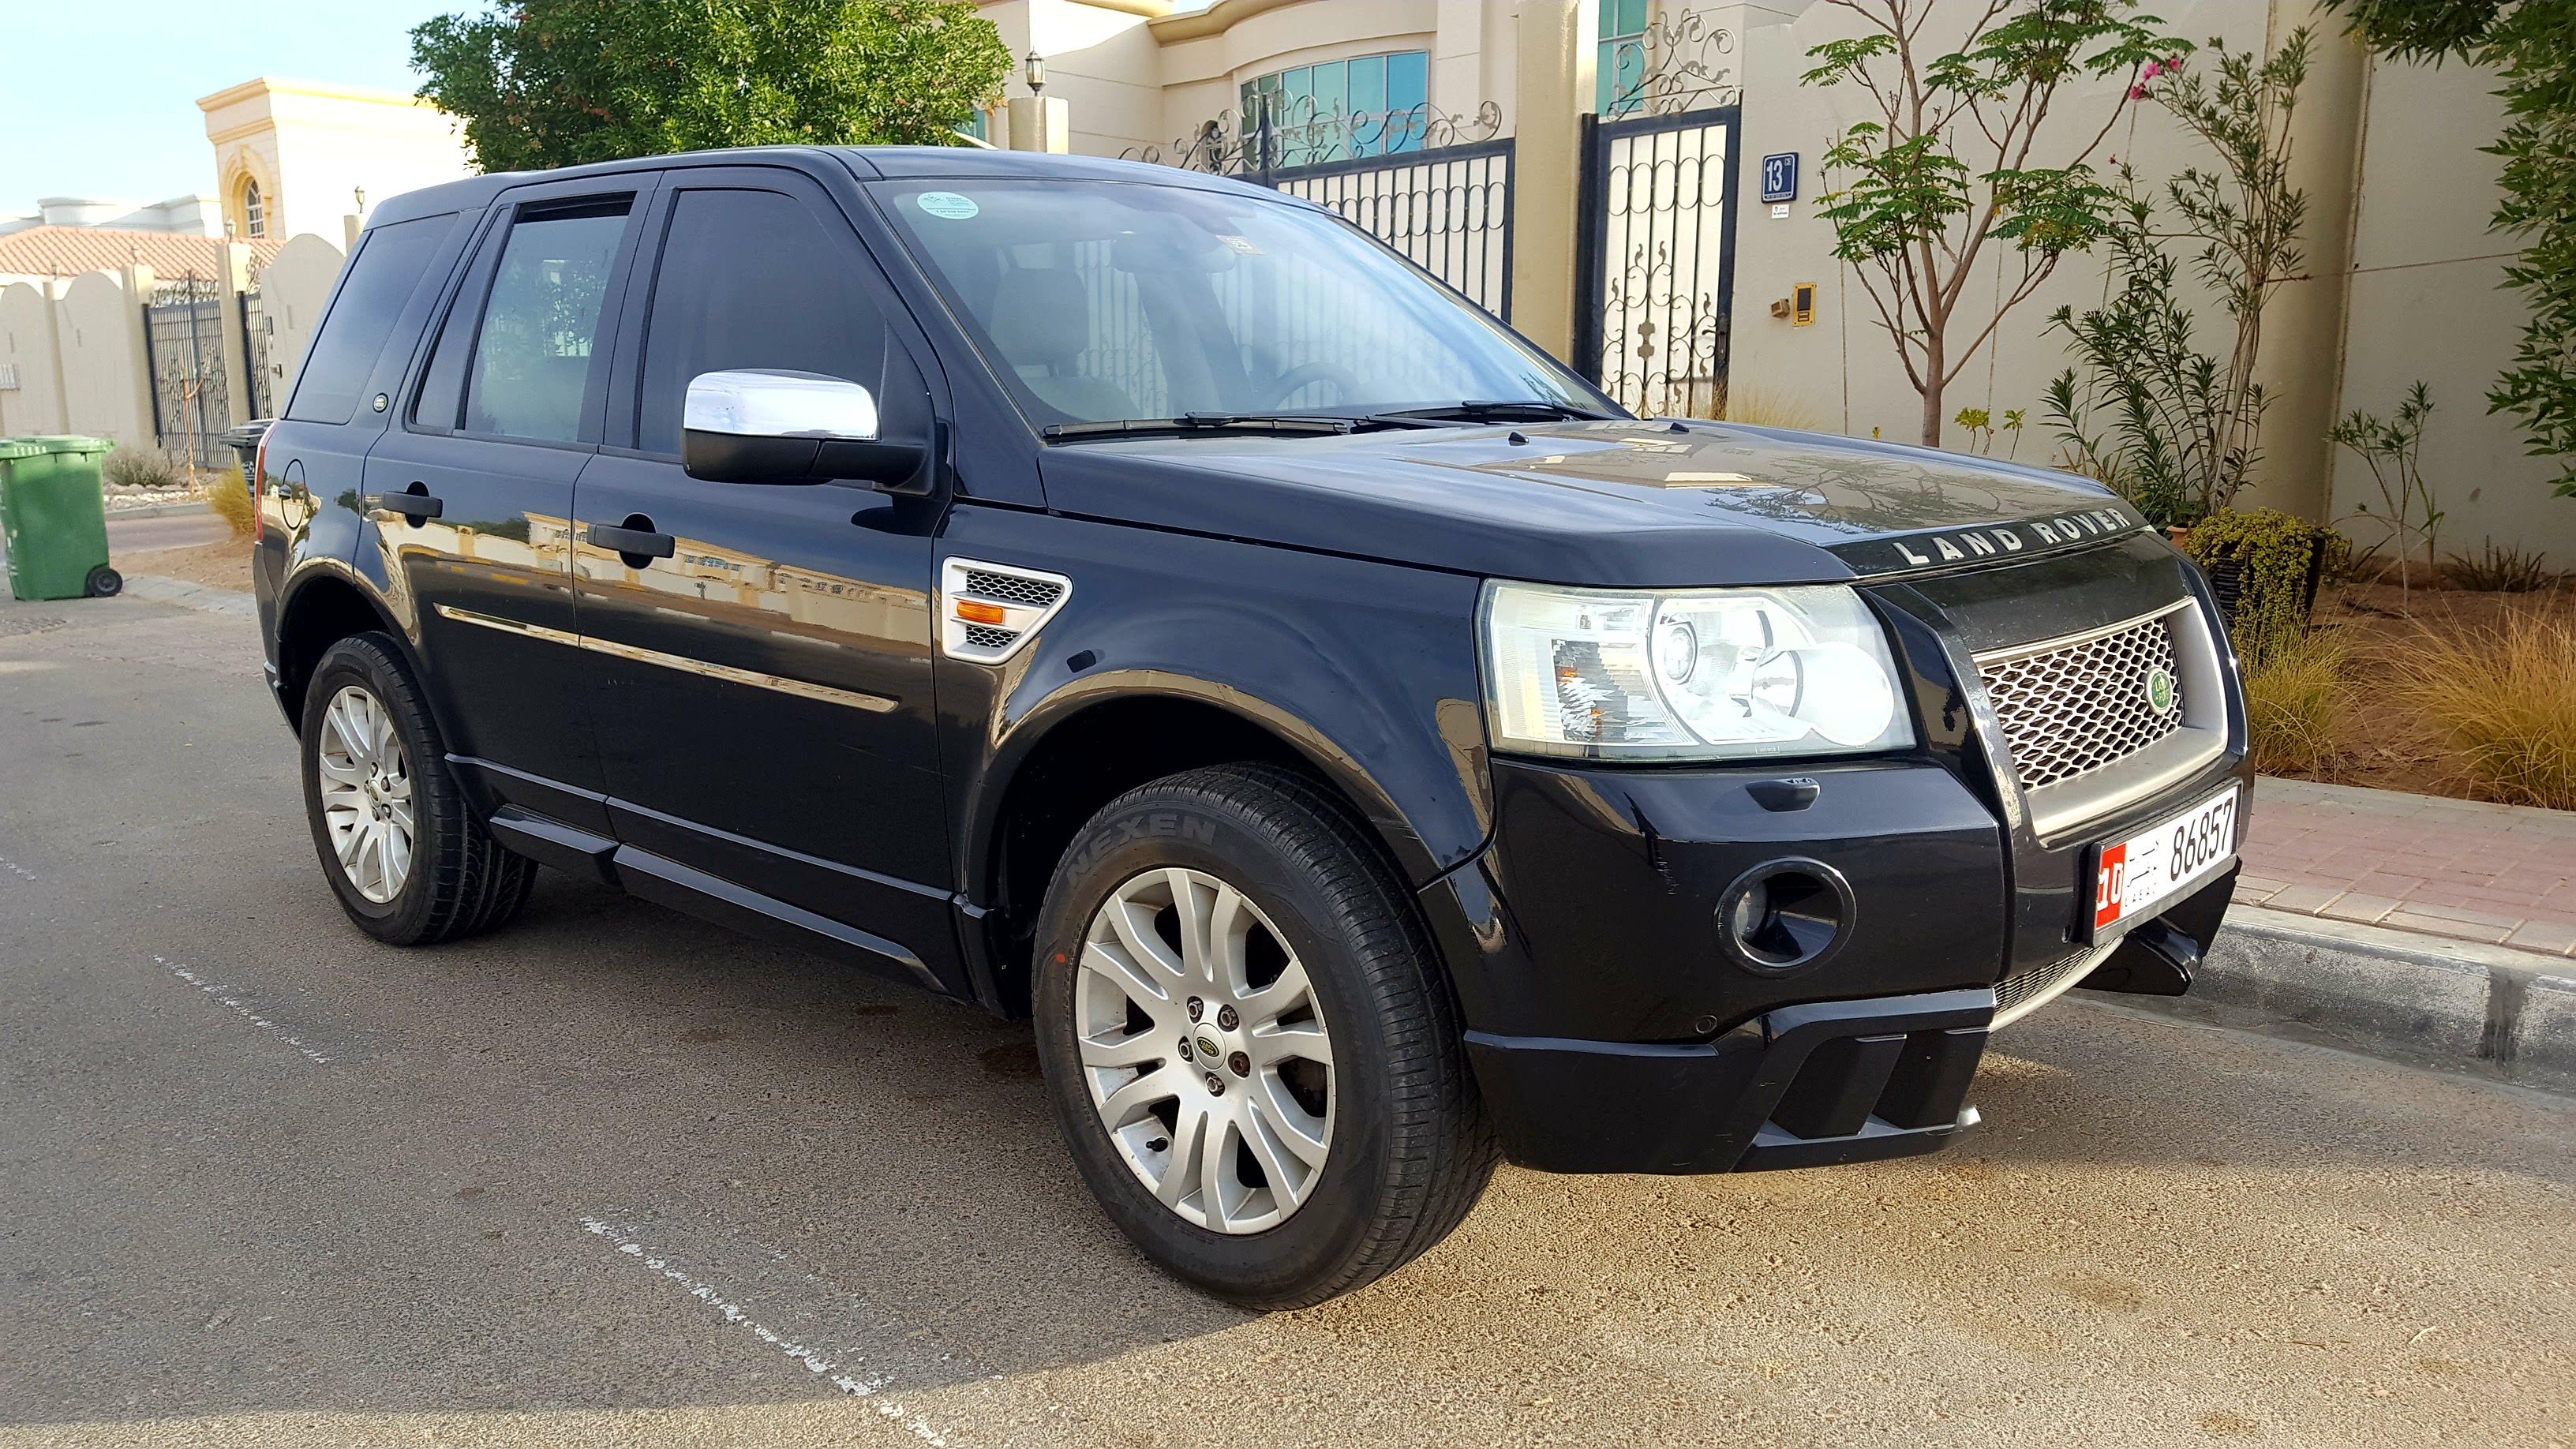 hse land img qatar option landrover rover price vehicles full living